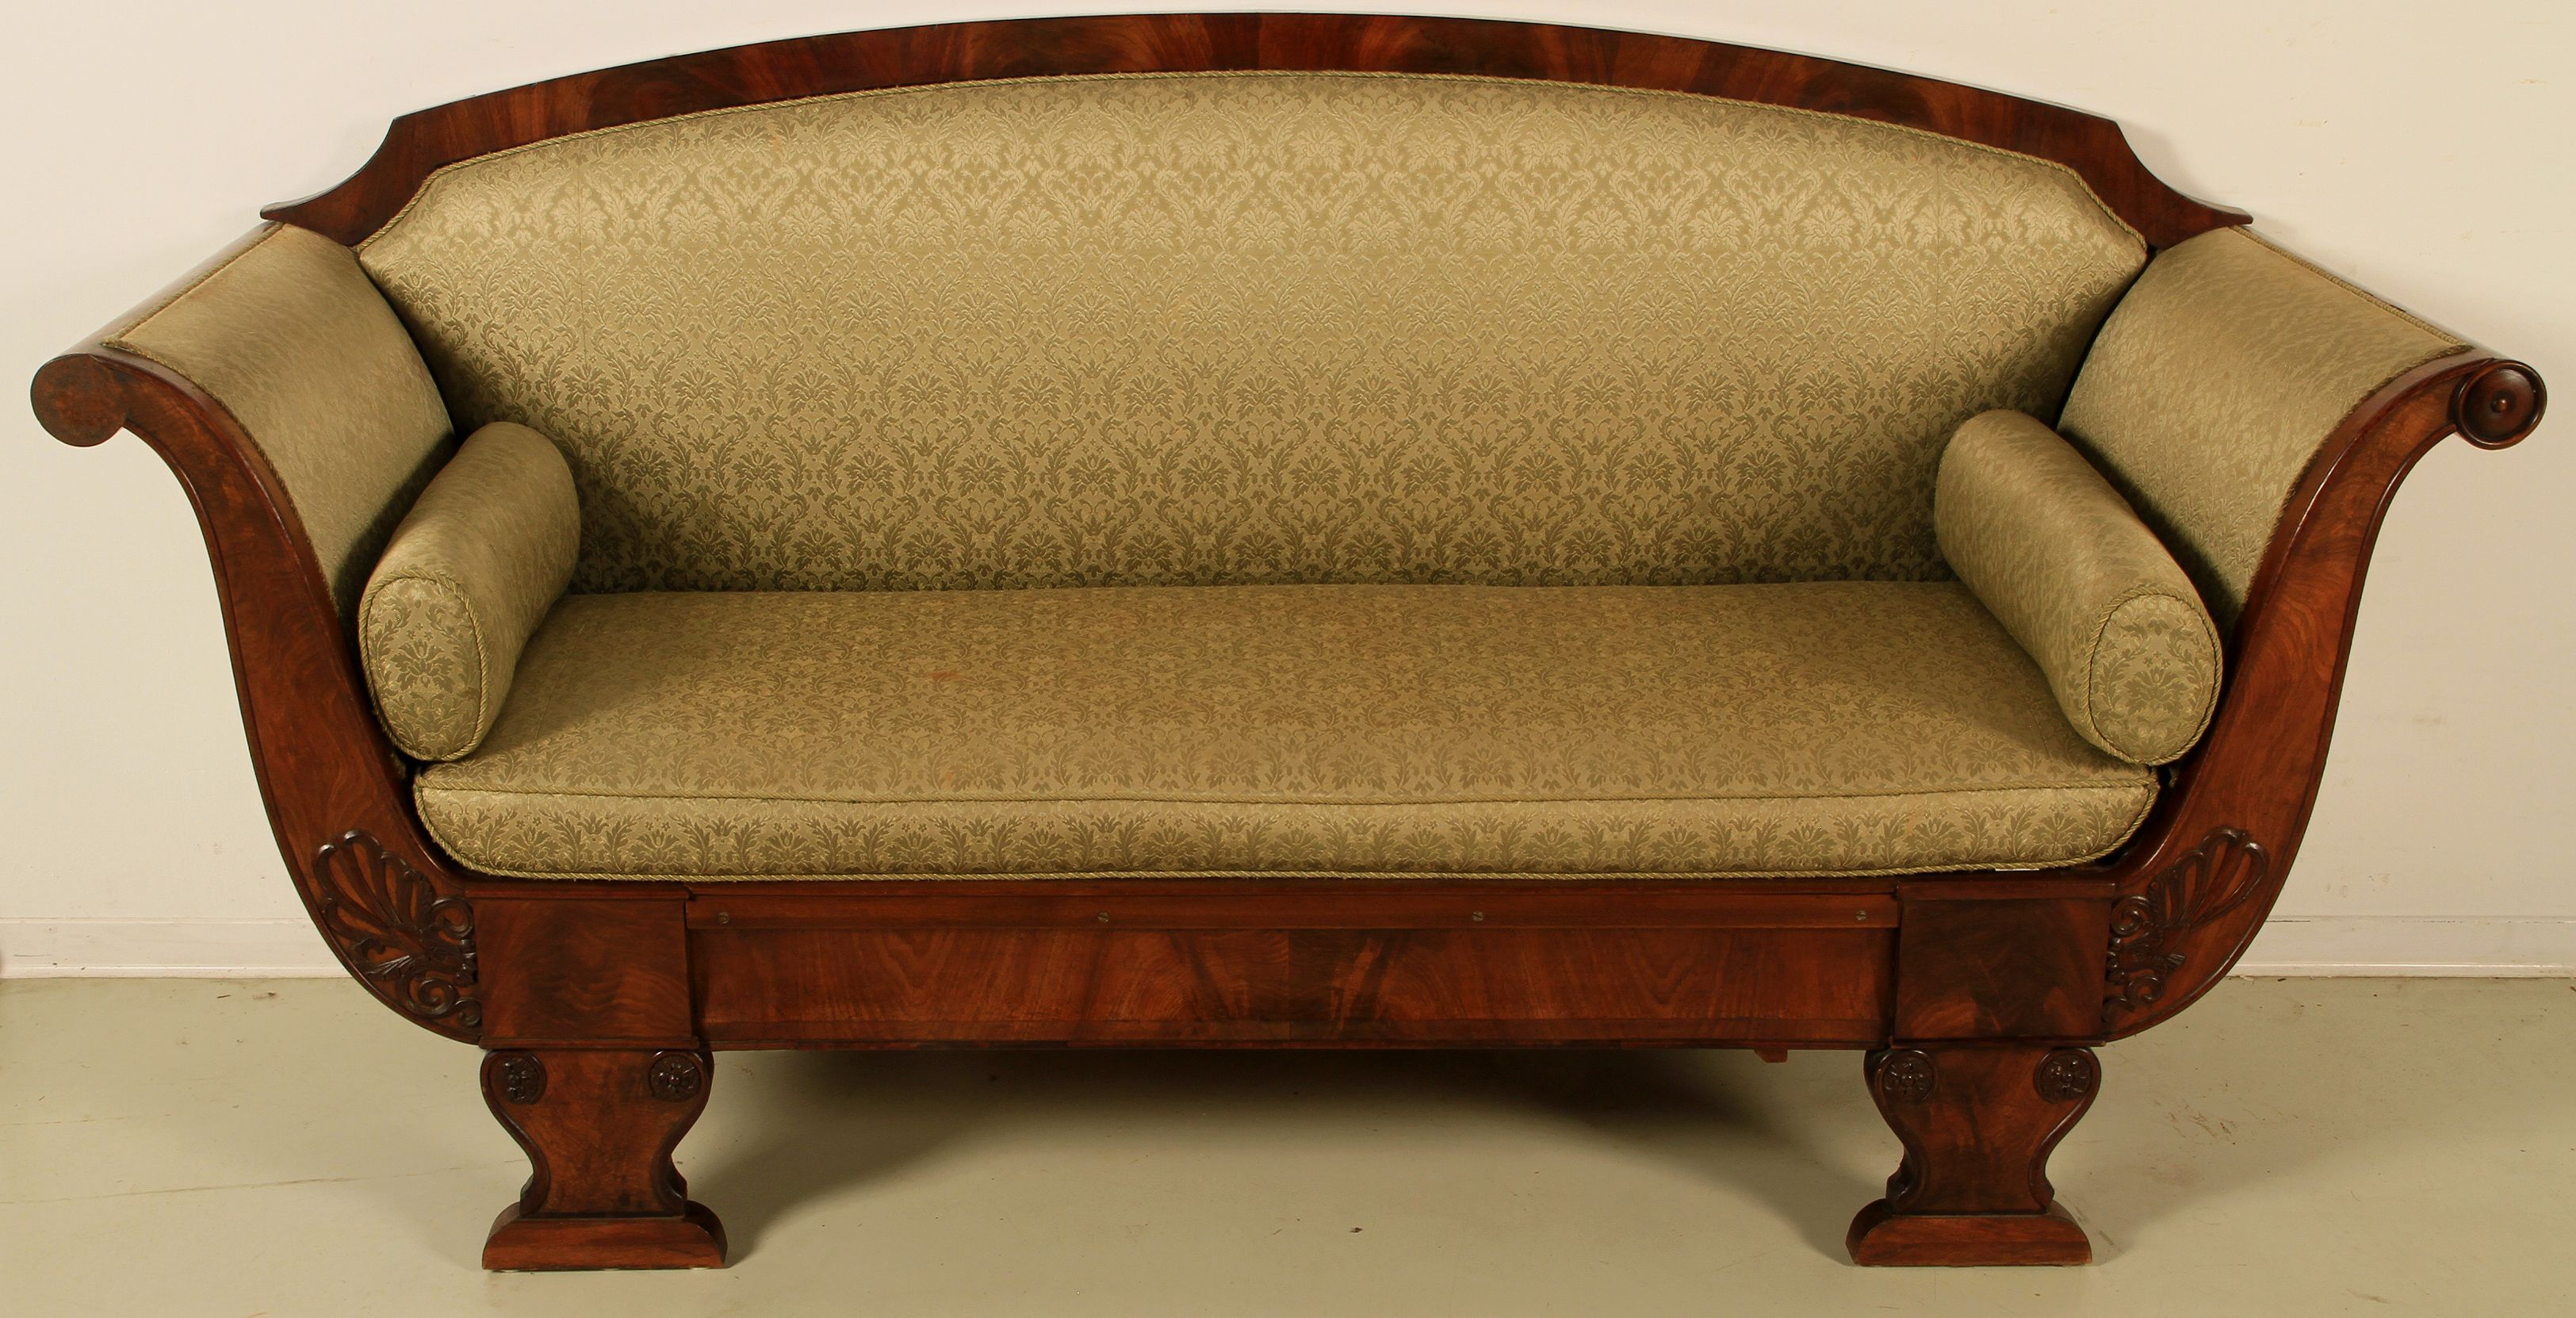 Biedermeier Sofa in Gondelform Epoche  Biedermeier Holzart  Mahagoni Mae  Hhe 100 cm